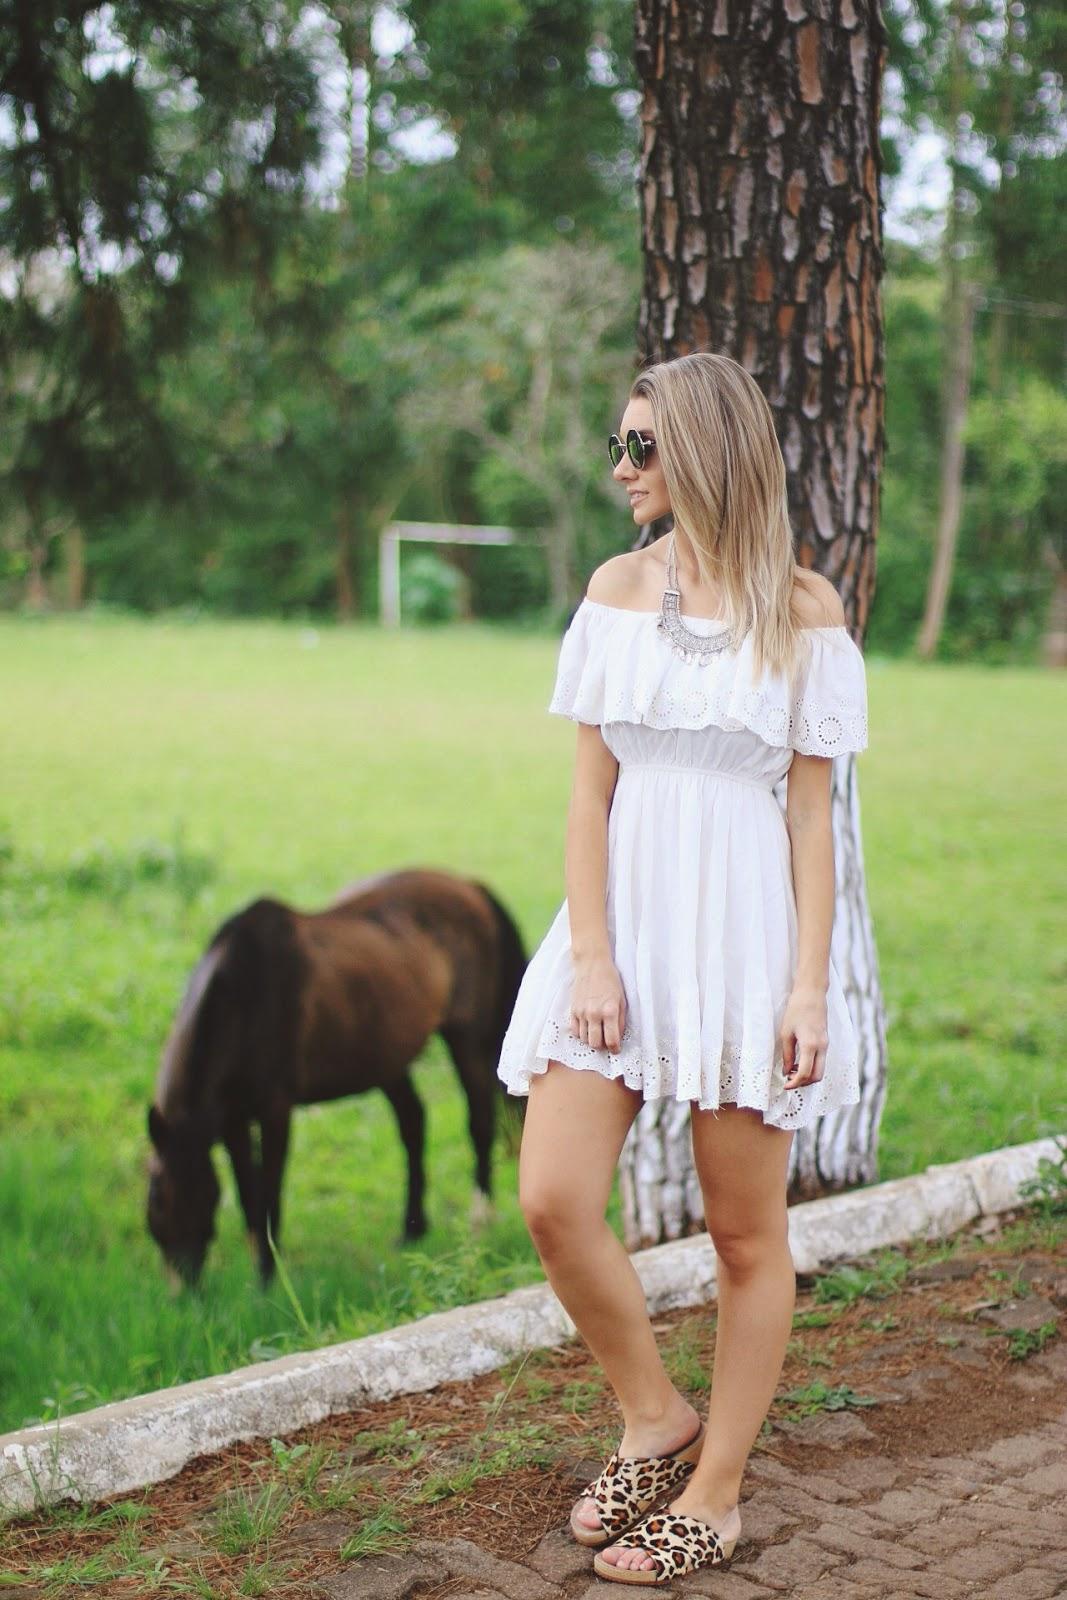 Vestido Ombro a Ombro tipo cigana / Modelagem, Corte e Costura